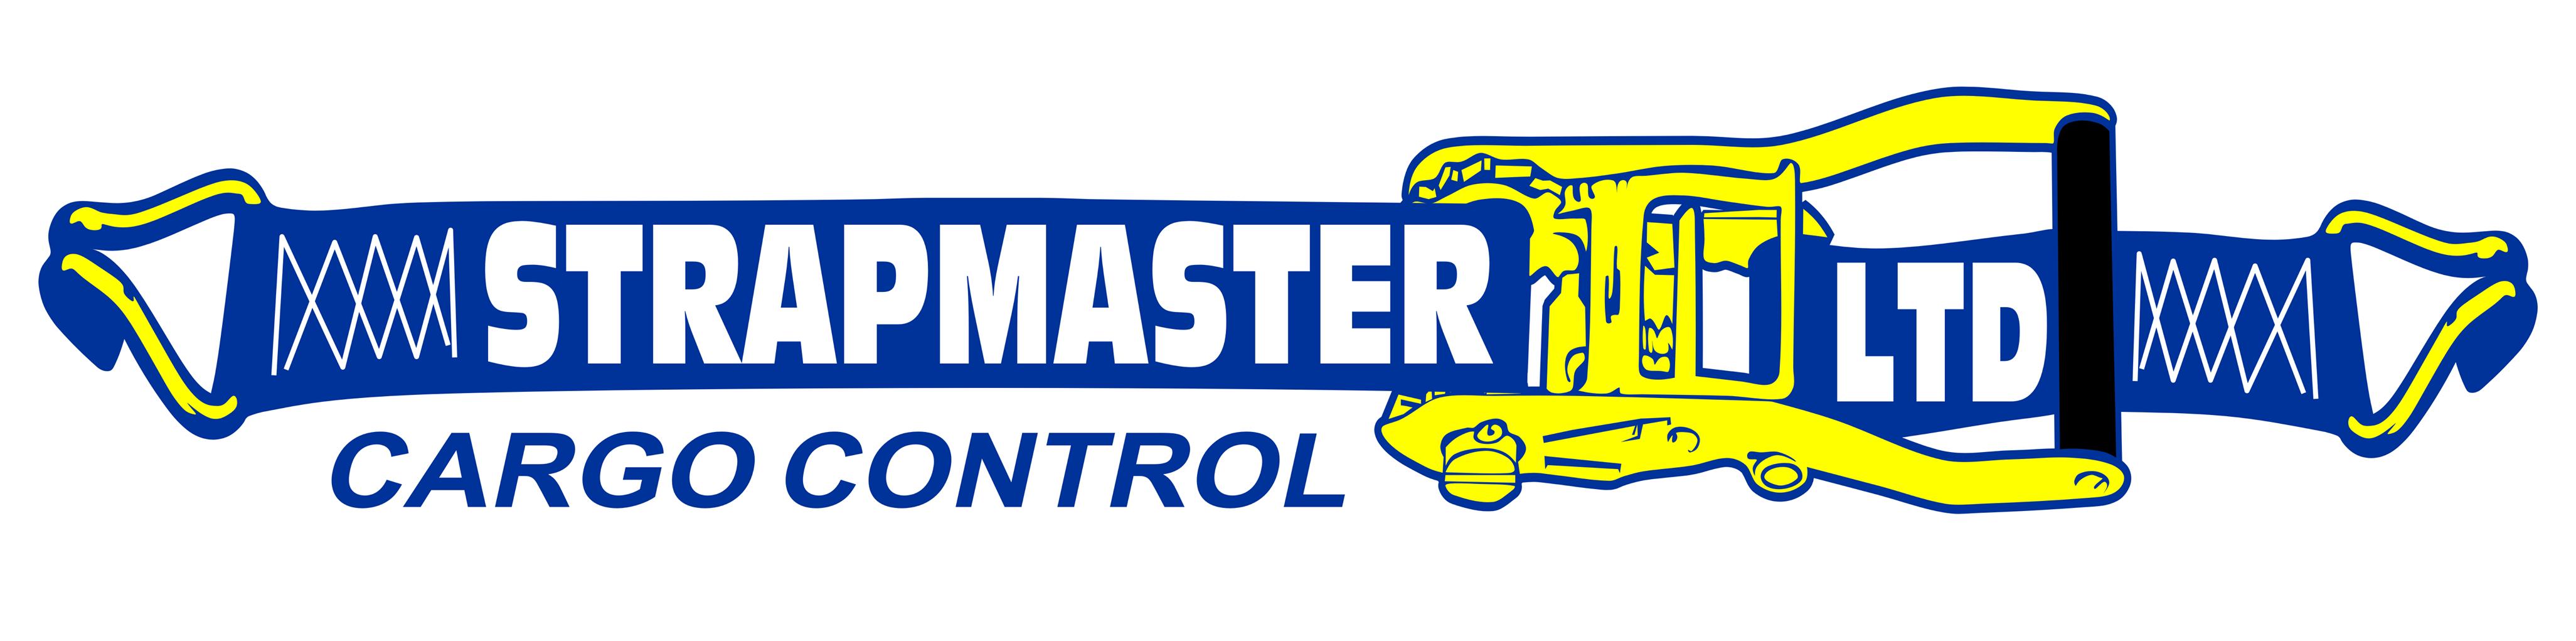 Strapmaster Ltd – Cargo Control